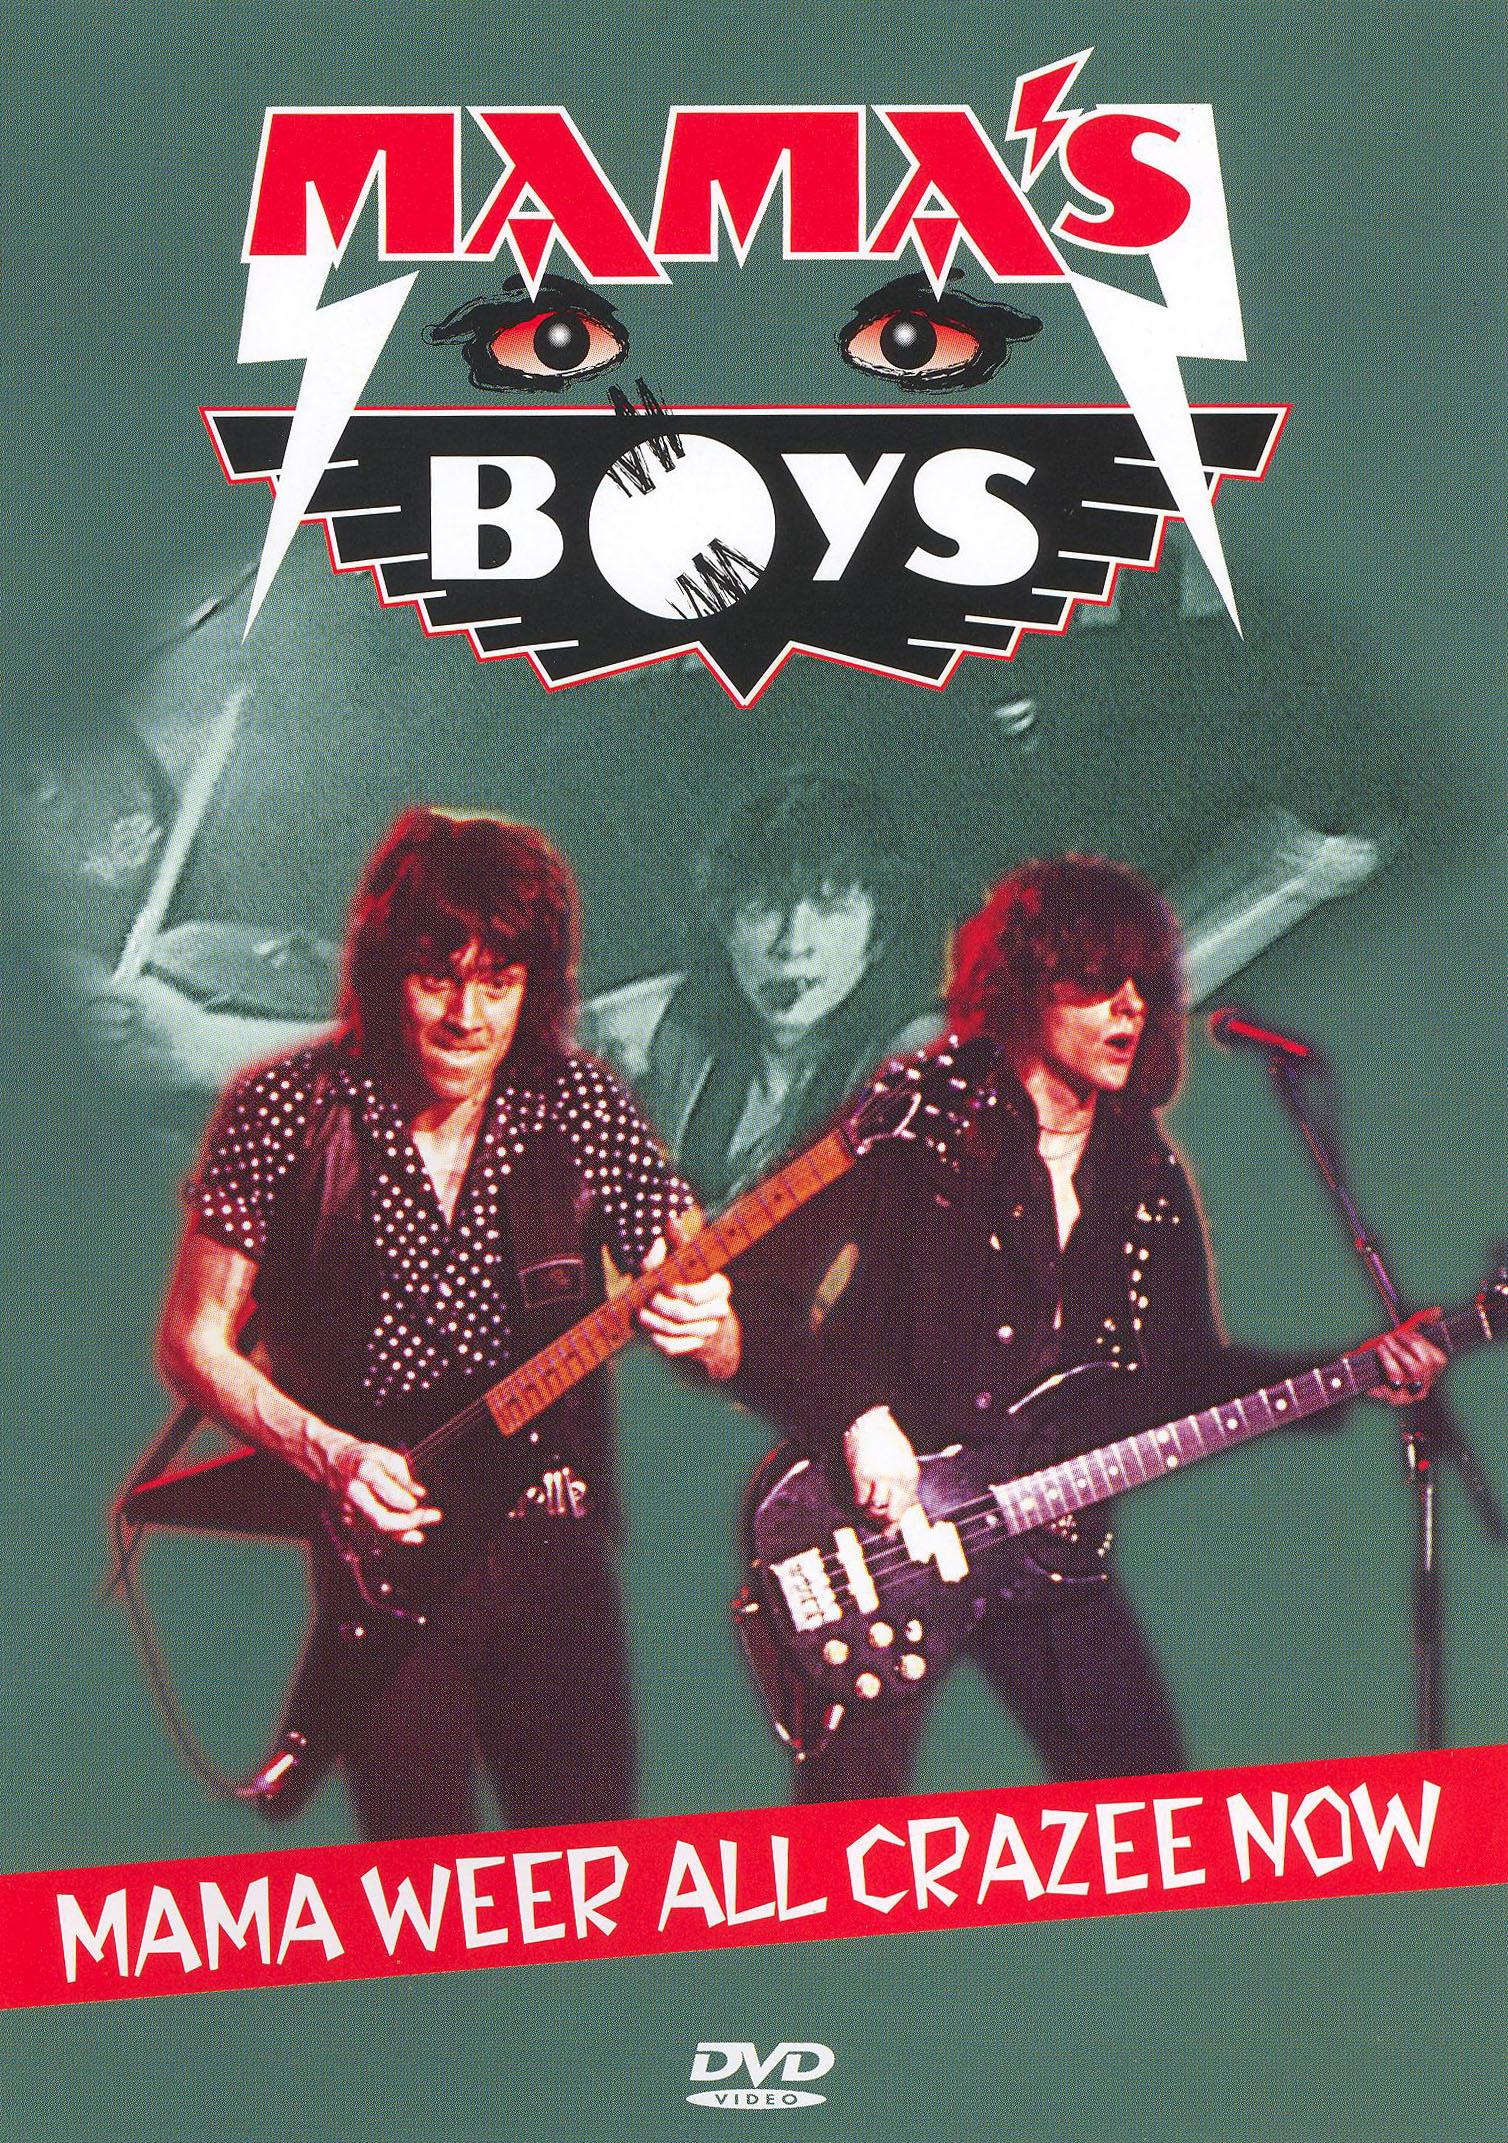 Mama's Boys: Mama Weer All Crazee Now - Mama's Boys Live